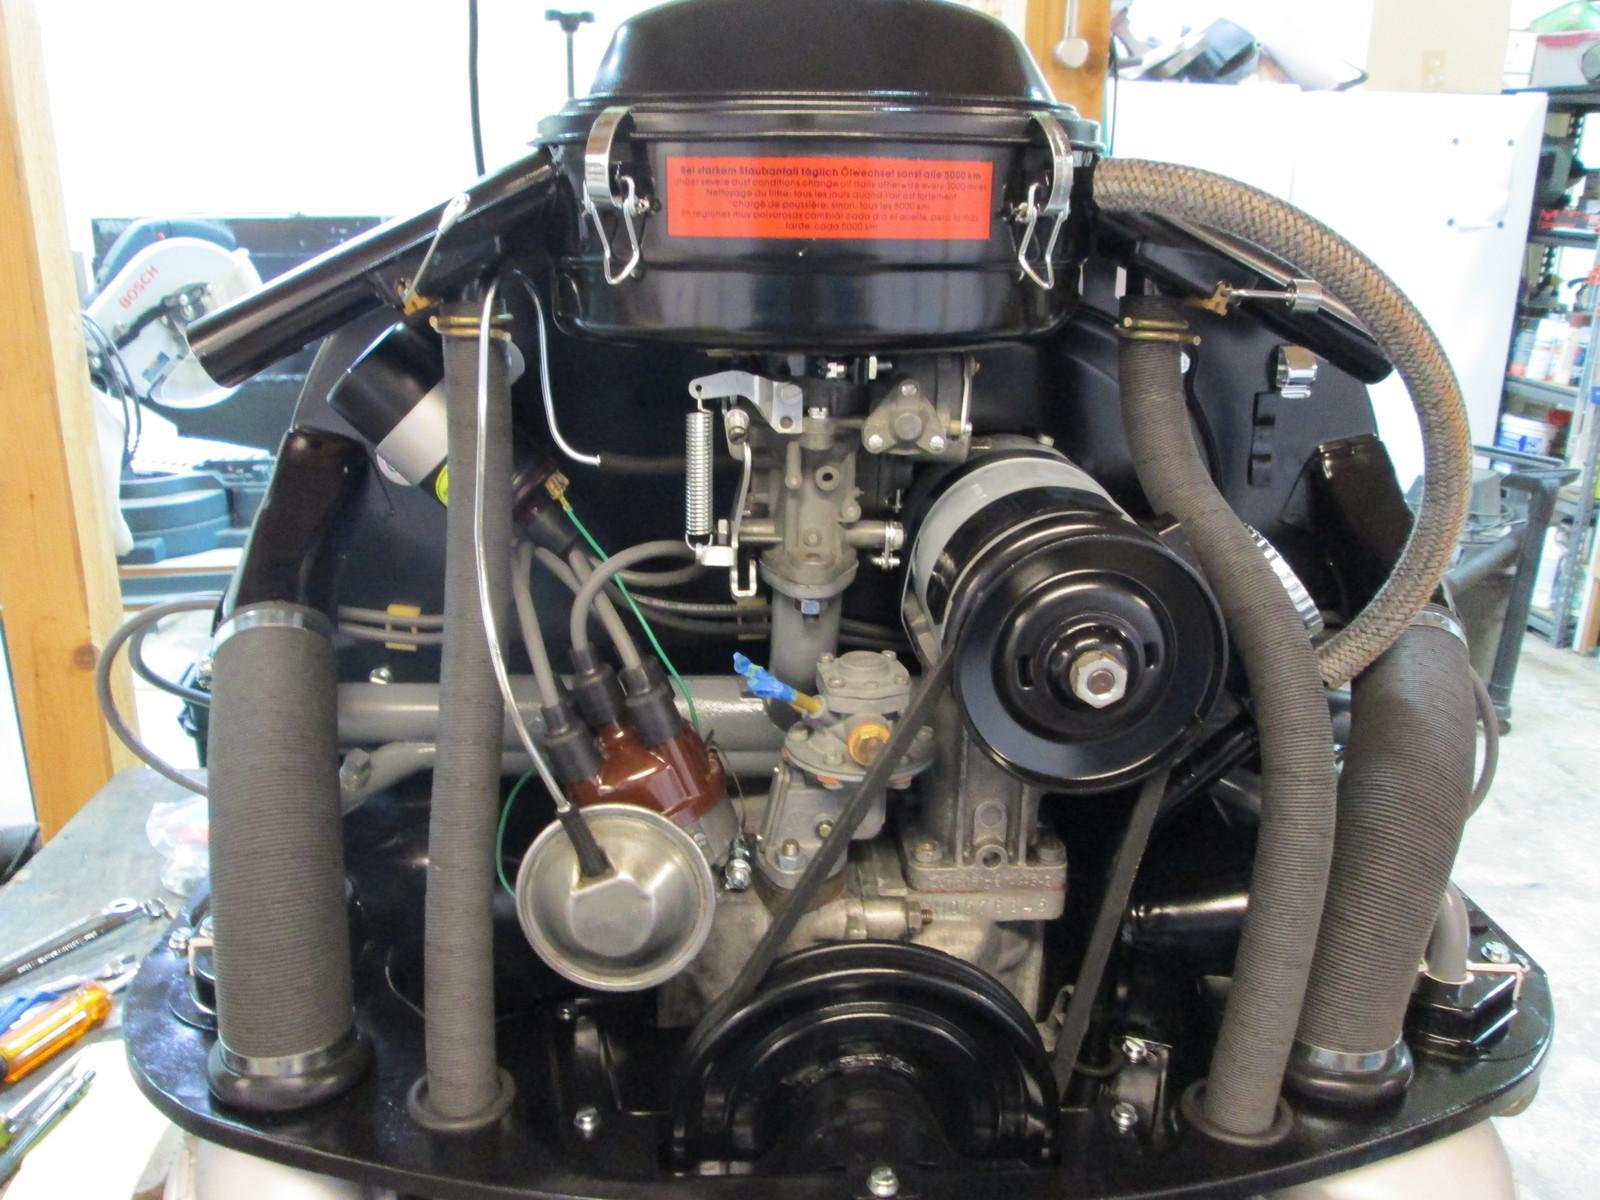 Wolfsburg Vw Engine Tin Diagram Electrical Work Wiring Diagram \u2022 VW  Bug Diagram Vw 1600 Bus Engine Tin Diagram